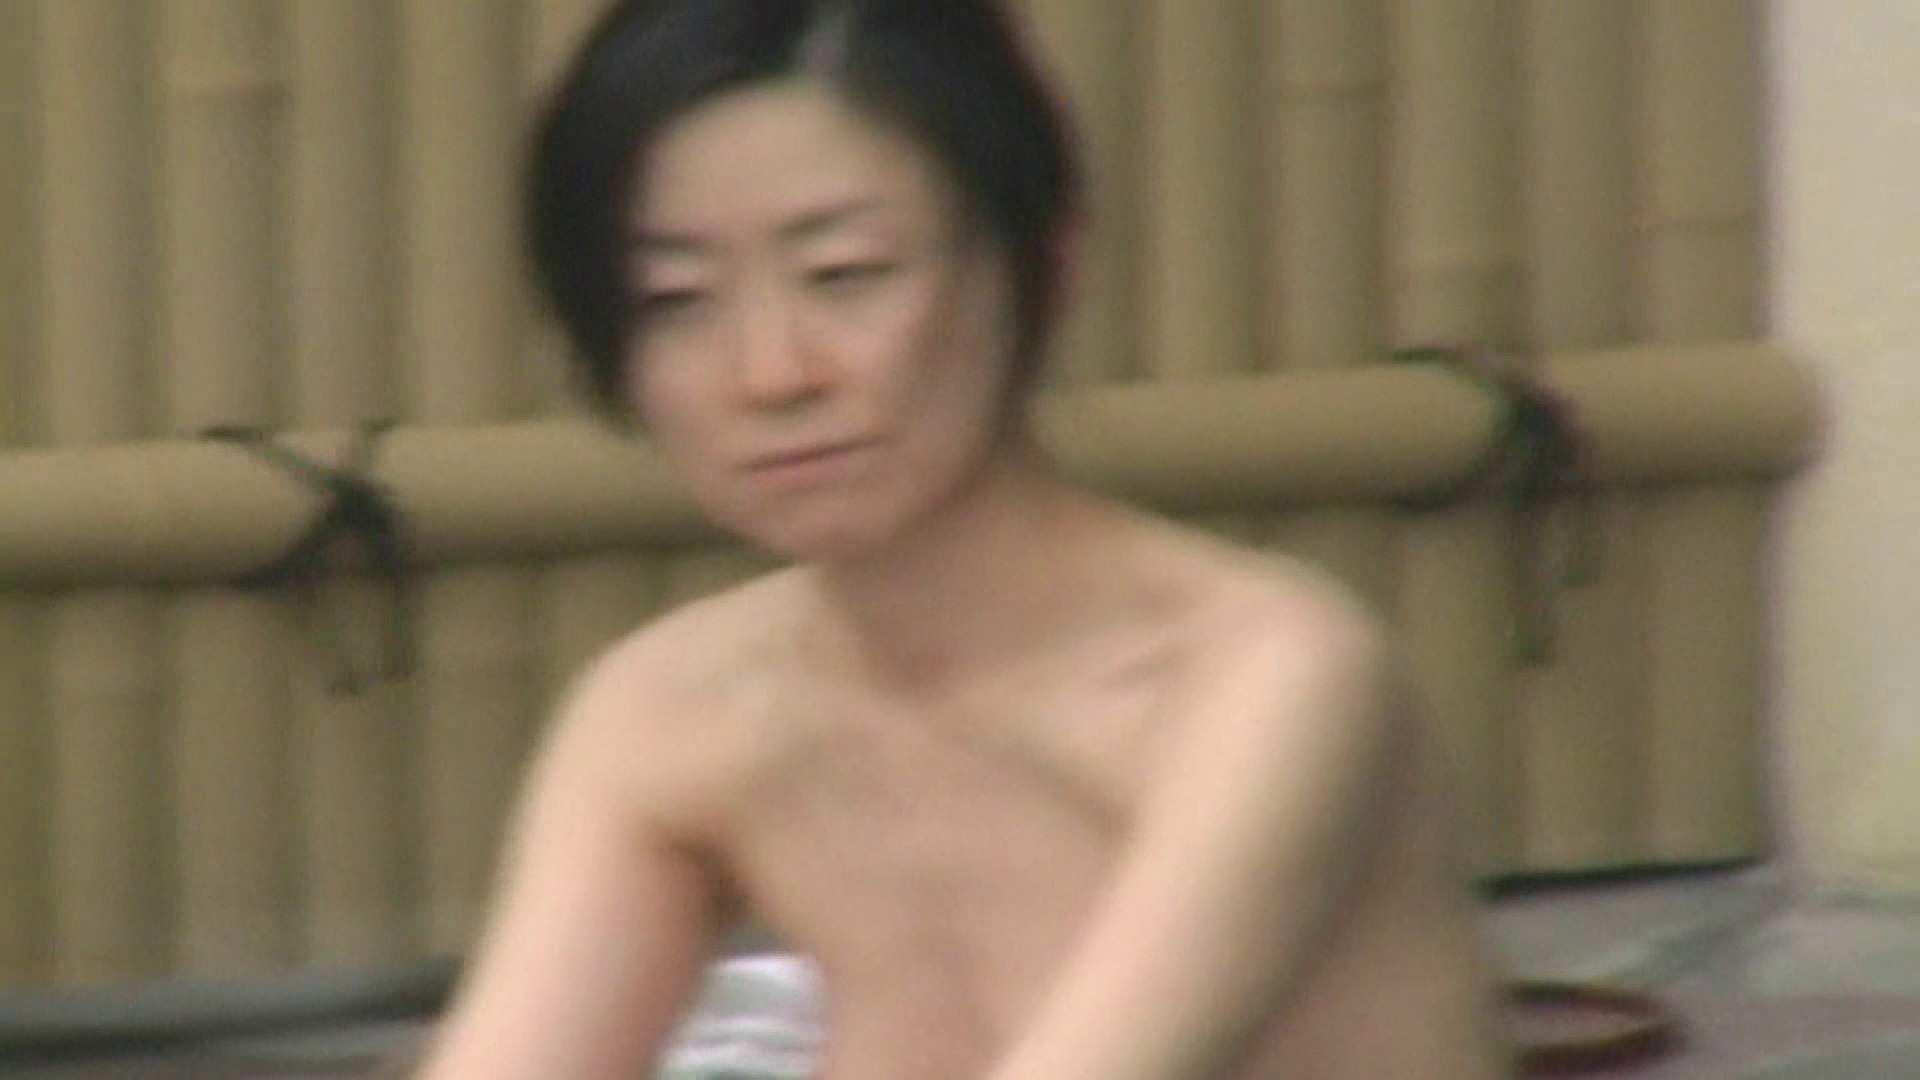 Aquaな露天風呂Vol.548 OLセックス のぞきエロ無料画像 103画像 8